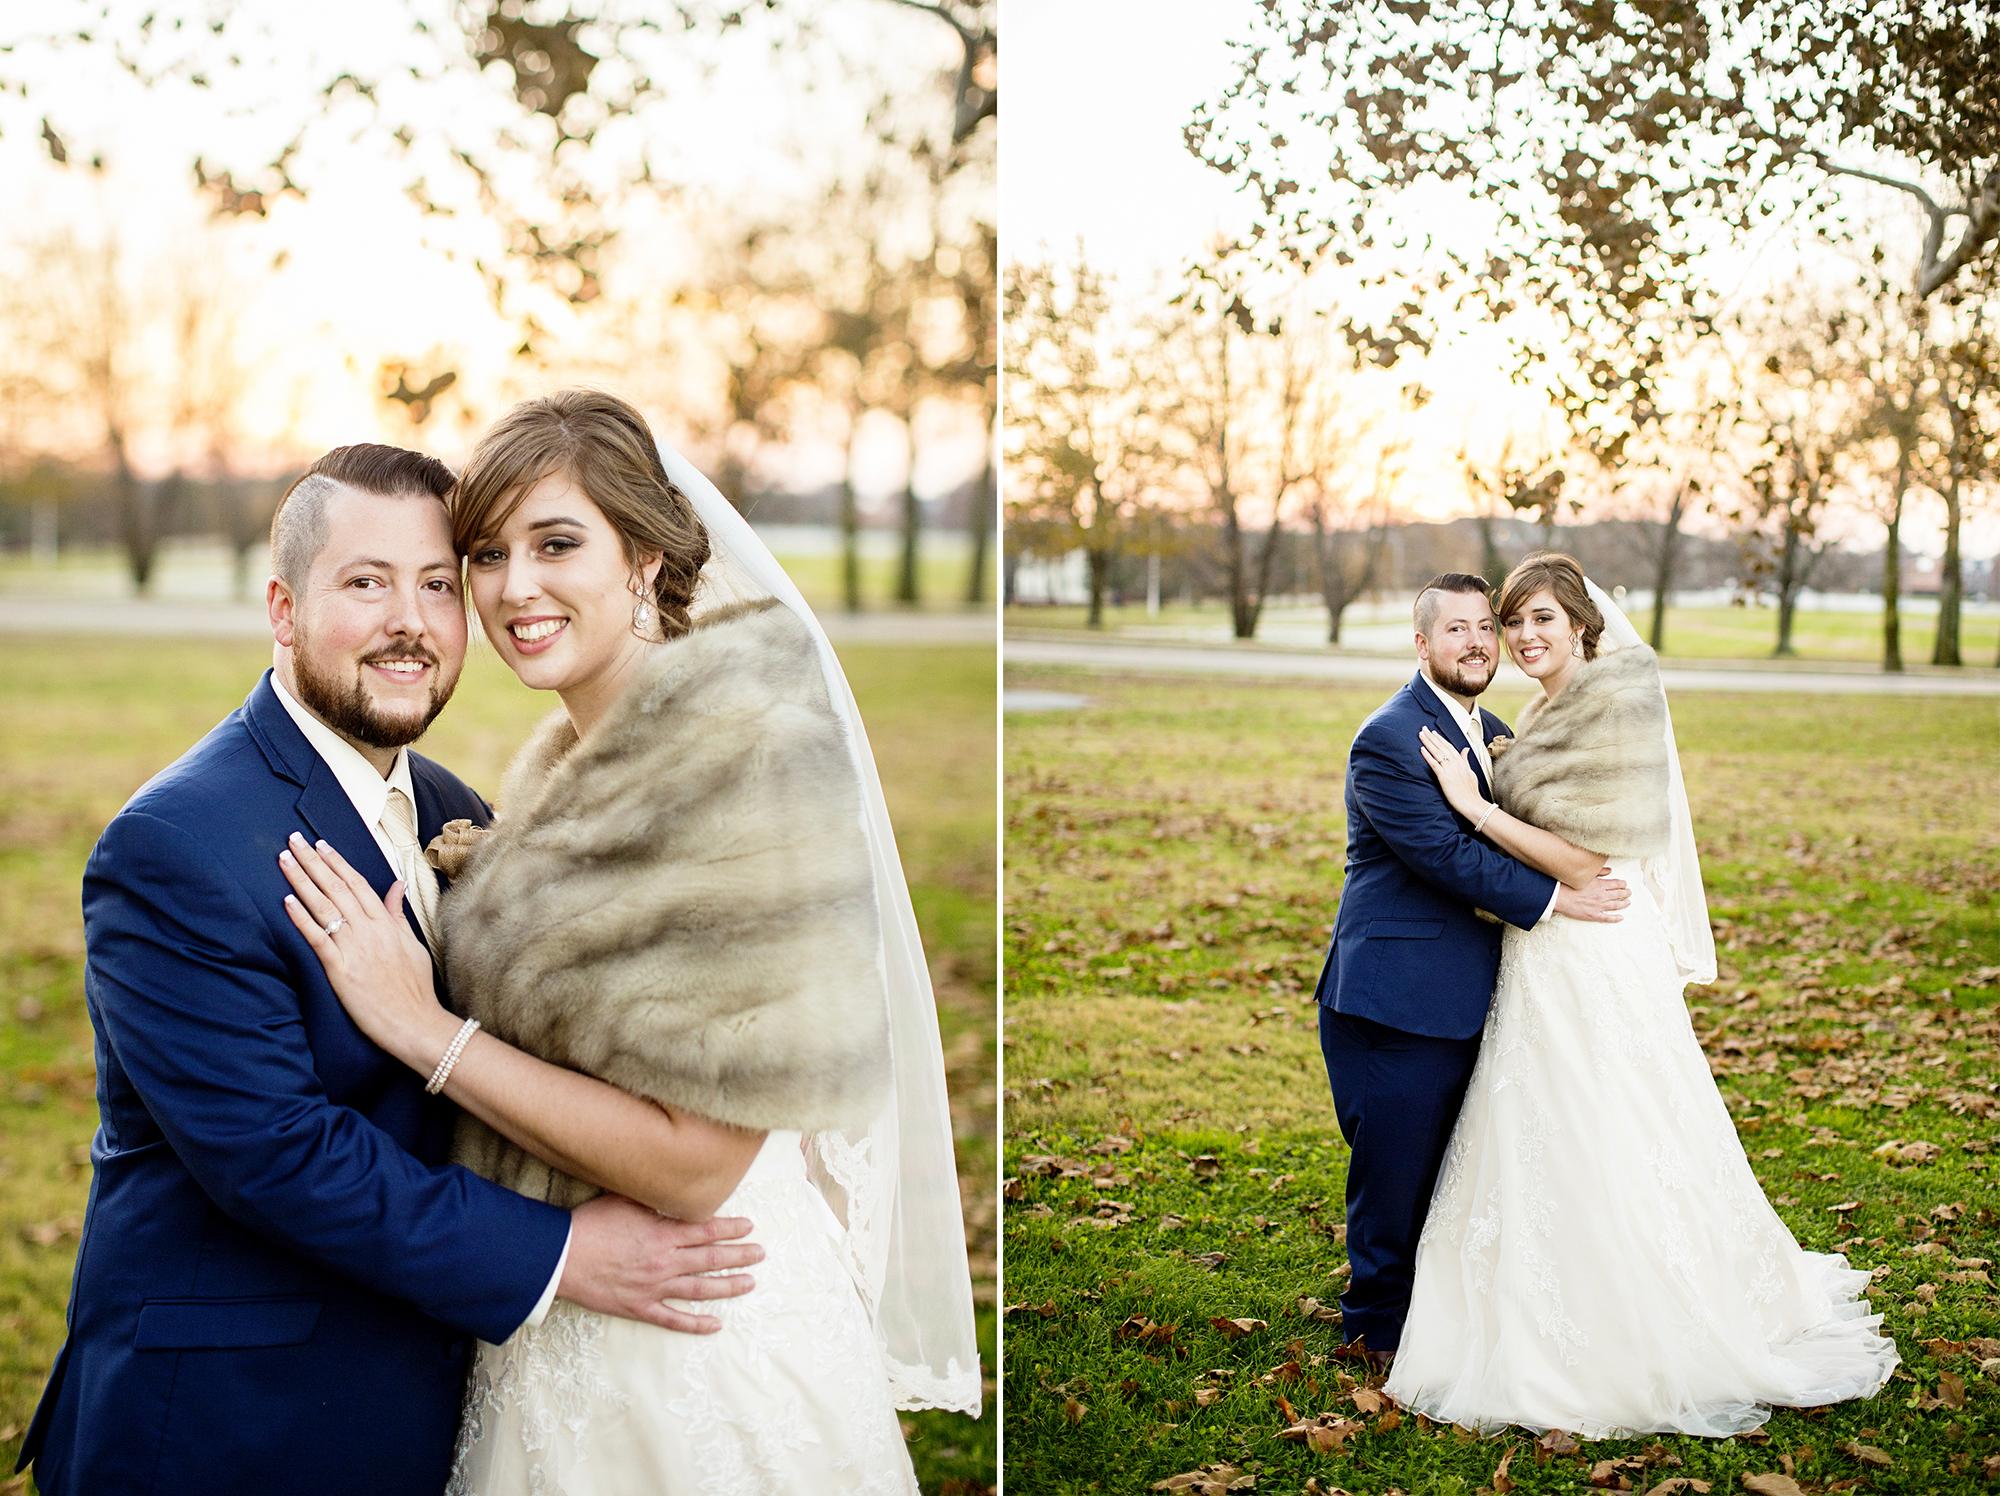 Seriously_Sabrina_Photography_Lexington_Kentucky_21c_Round_Barn_Red_Mile_Wedding_Gorley_47.jpg